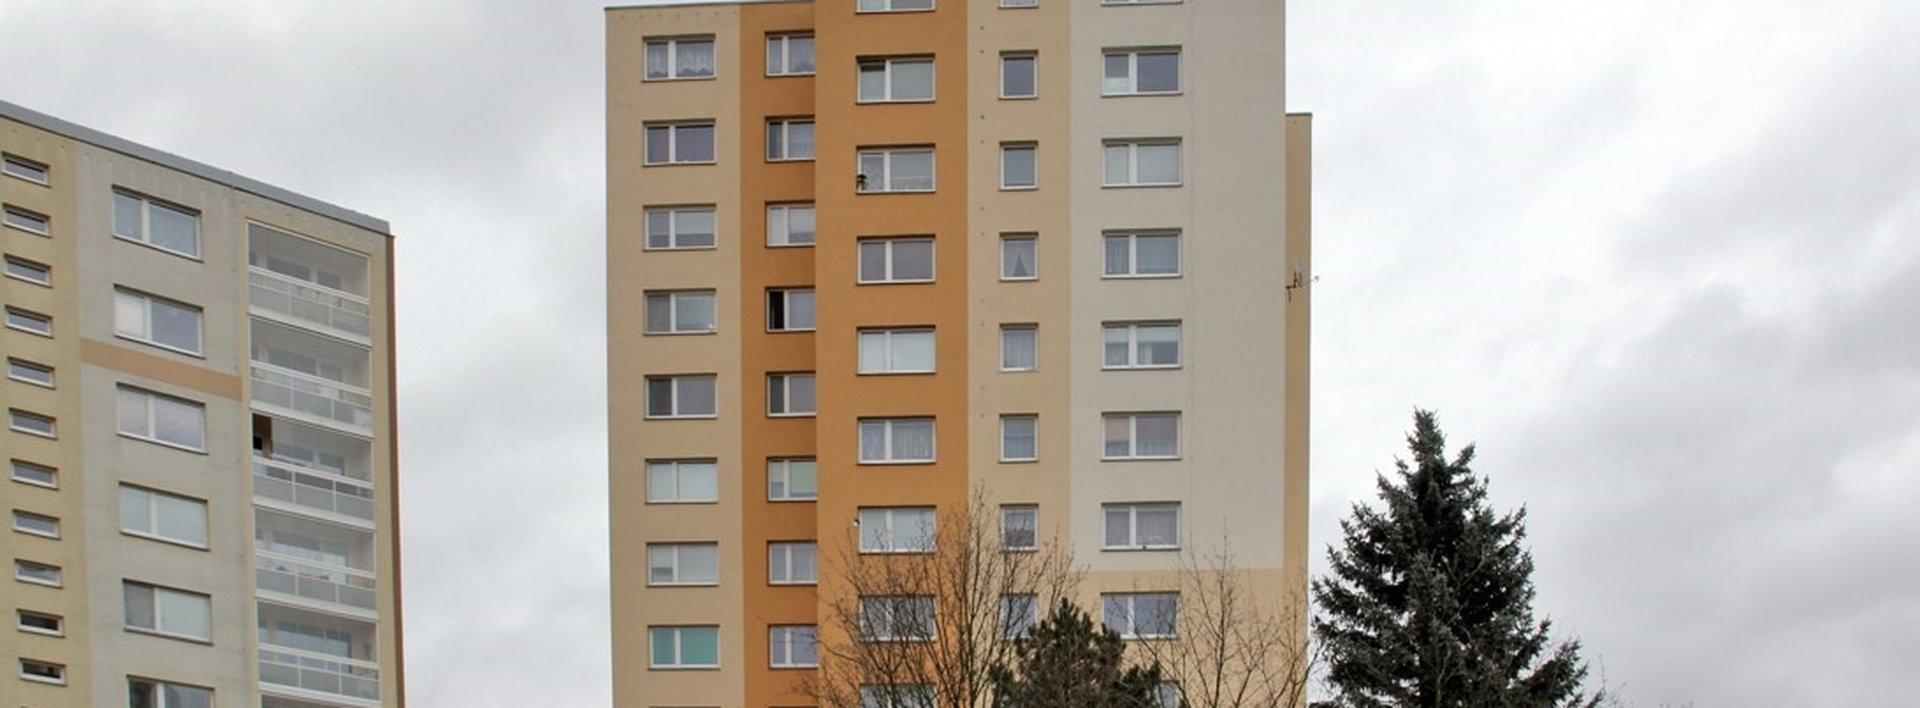 Prodej bytu 1+kk, 27 m², Ev.č.: N49000